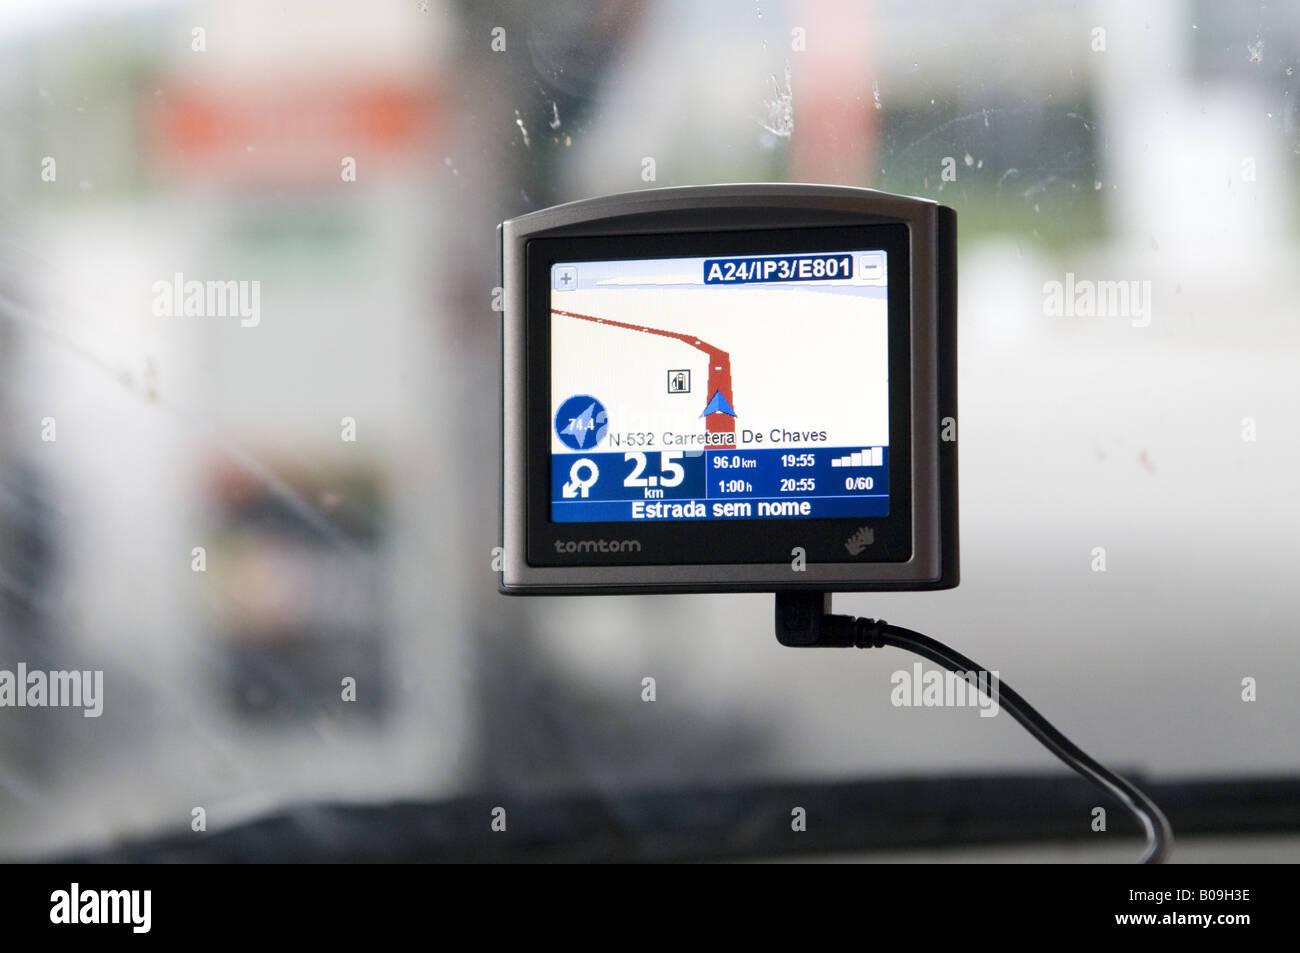 GPS satnav sattelite navigation system - Stock Image